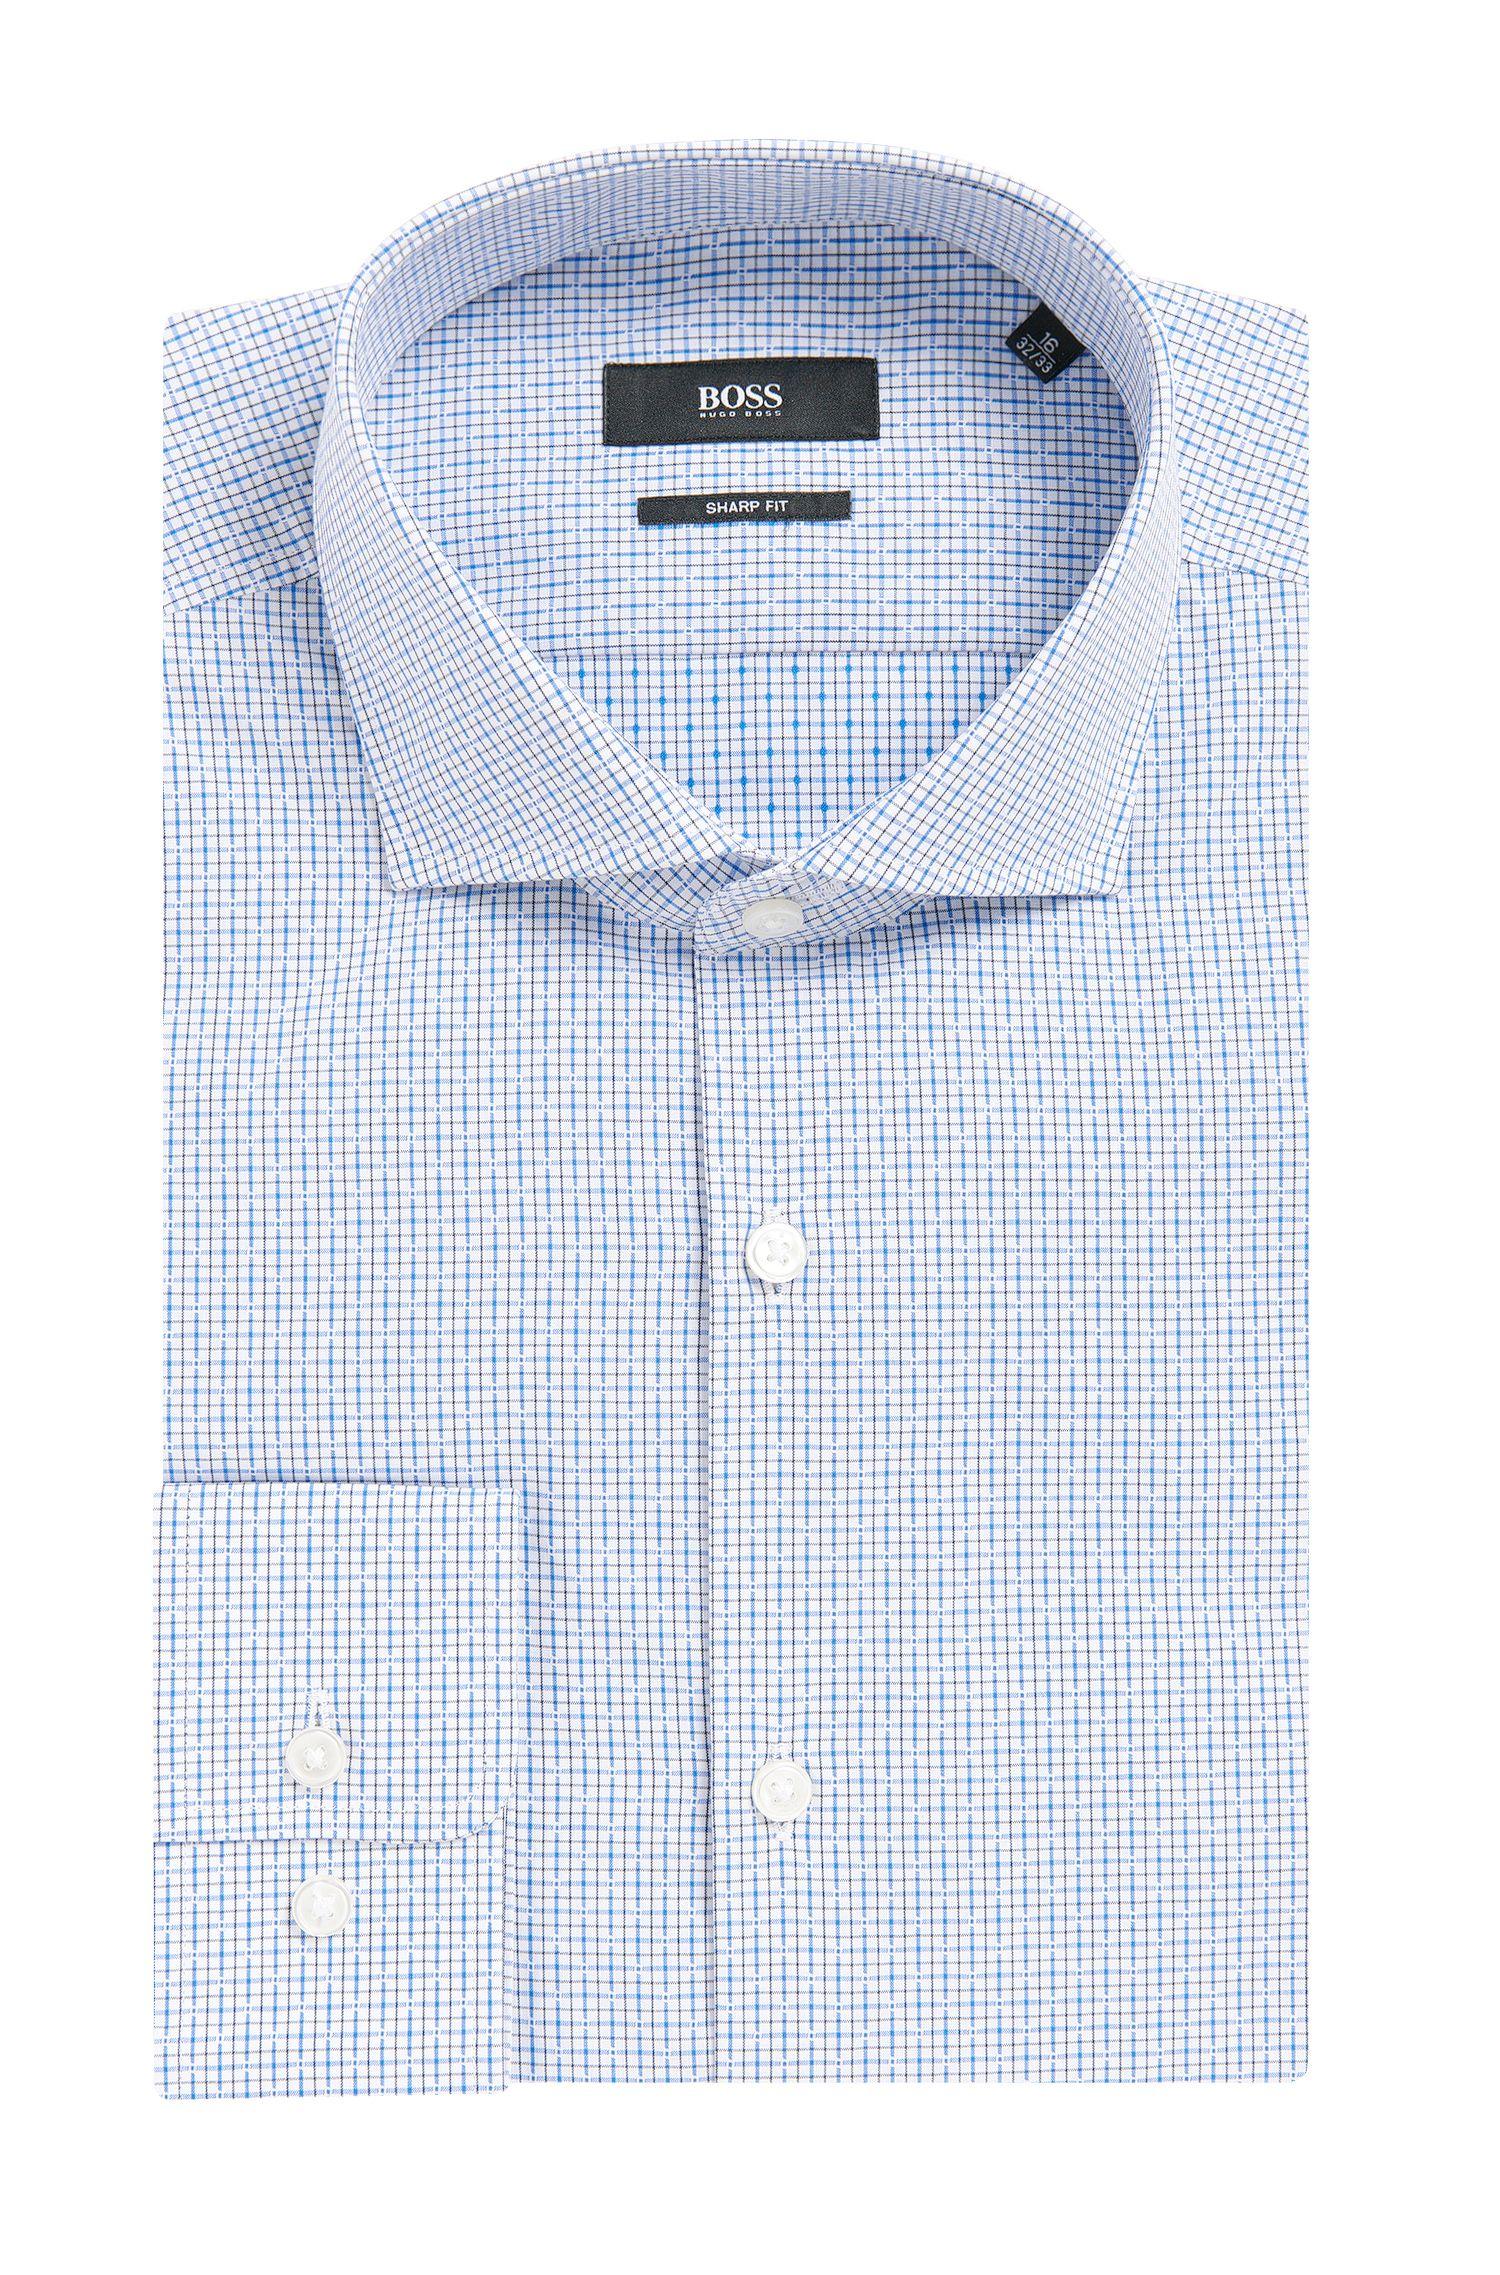 Checked Cotton Dress Shirt, Sharp Fit | Mark US